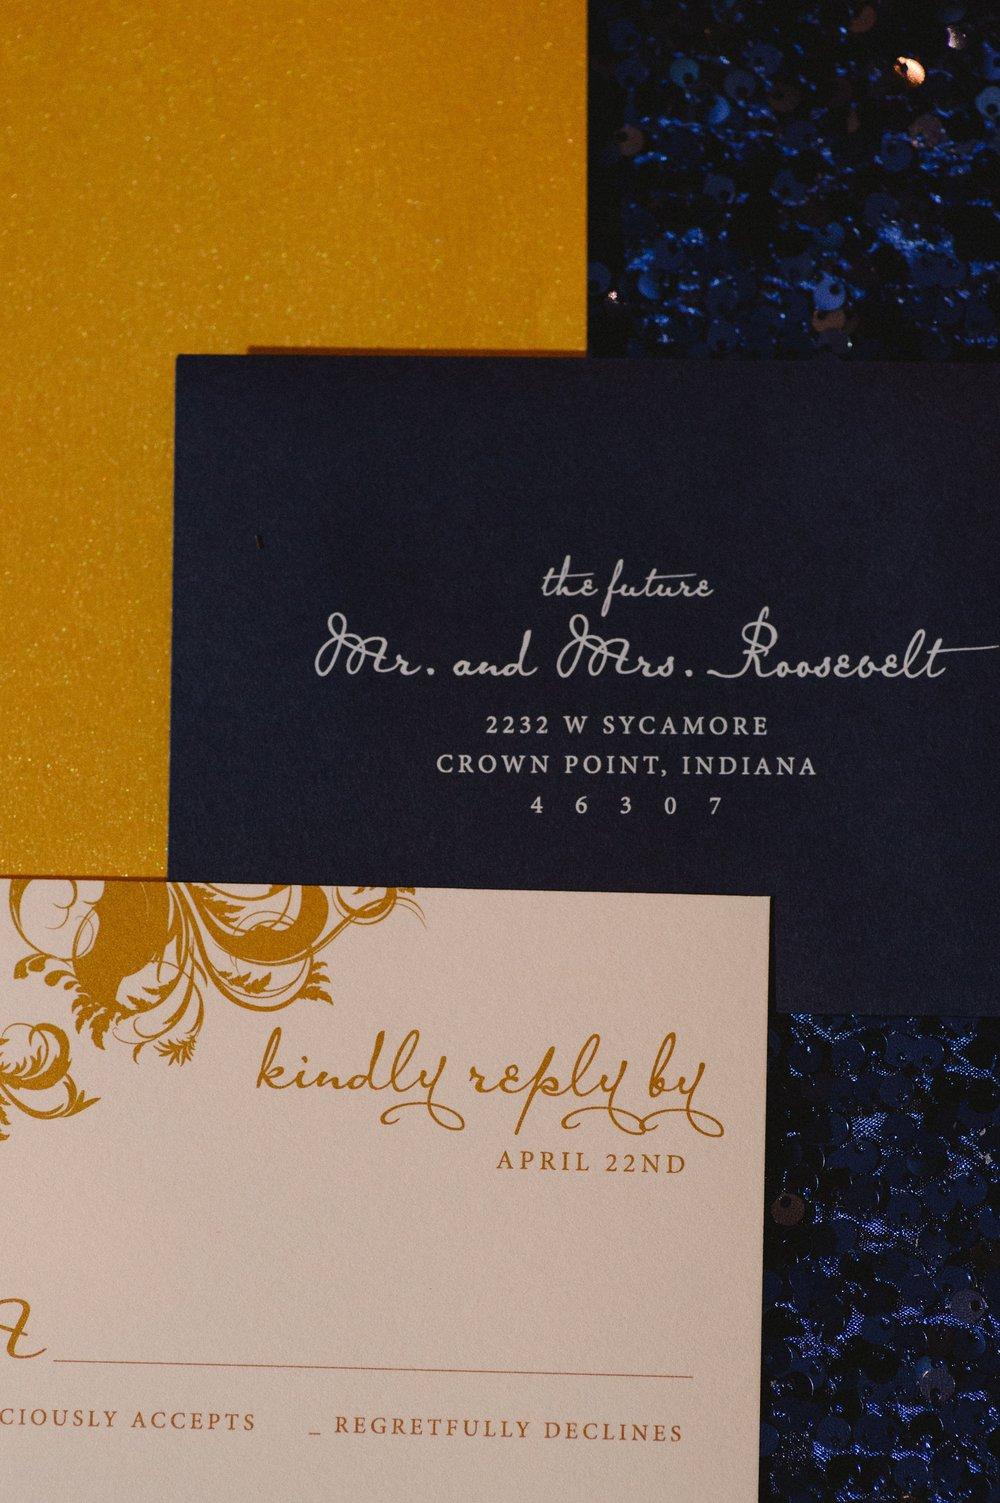 KatherineMurrayPhotography_StyledShoot_Wedding_BeautyAndTheBeast_ATaleAsOldAsTime_theAllure_LaPorteIndiana00250-min.jpg